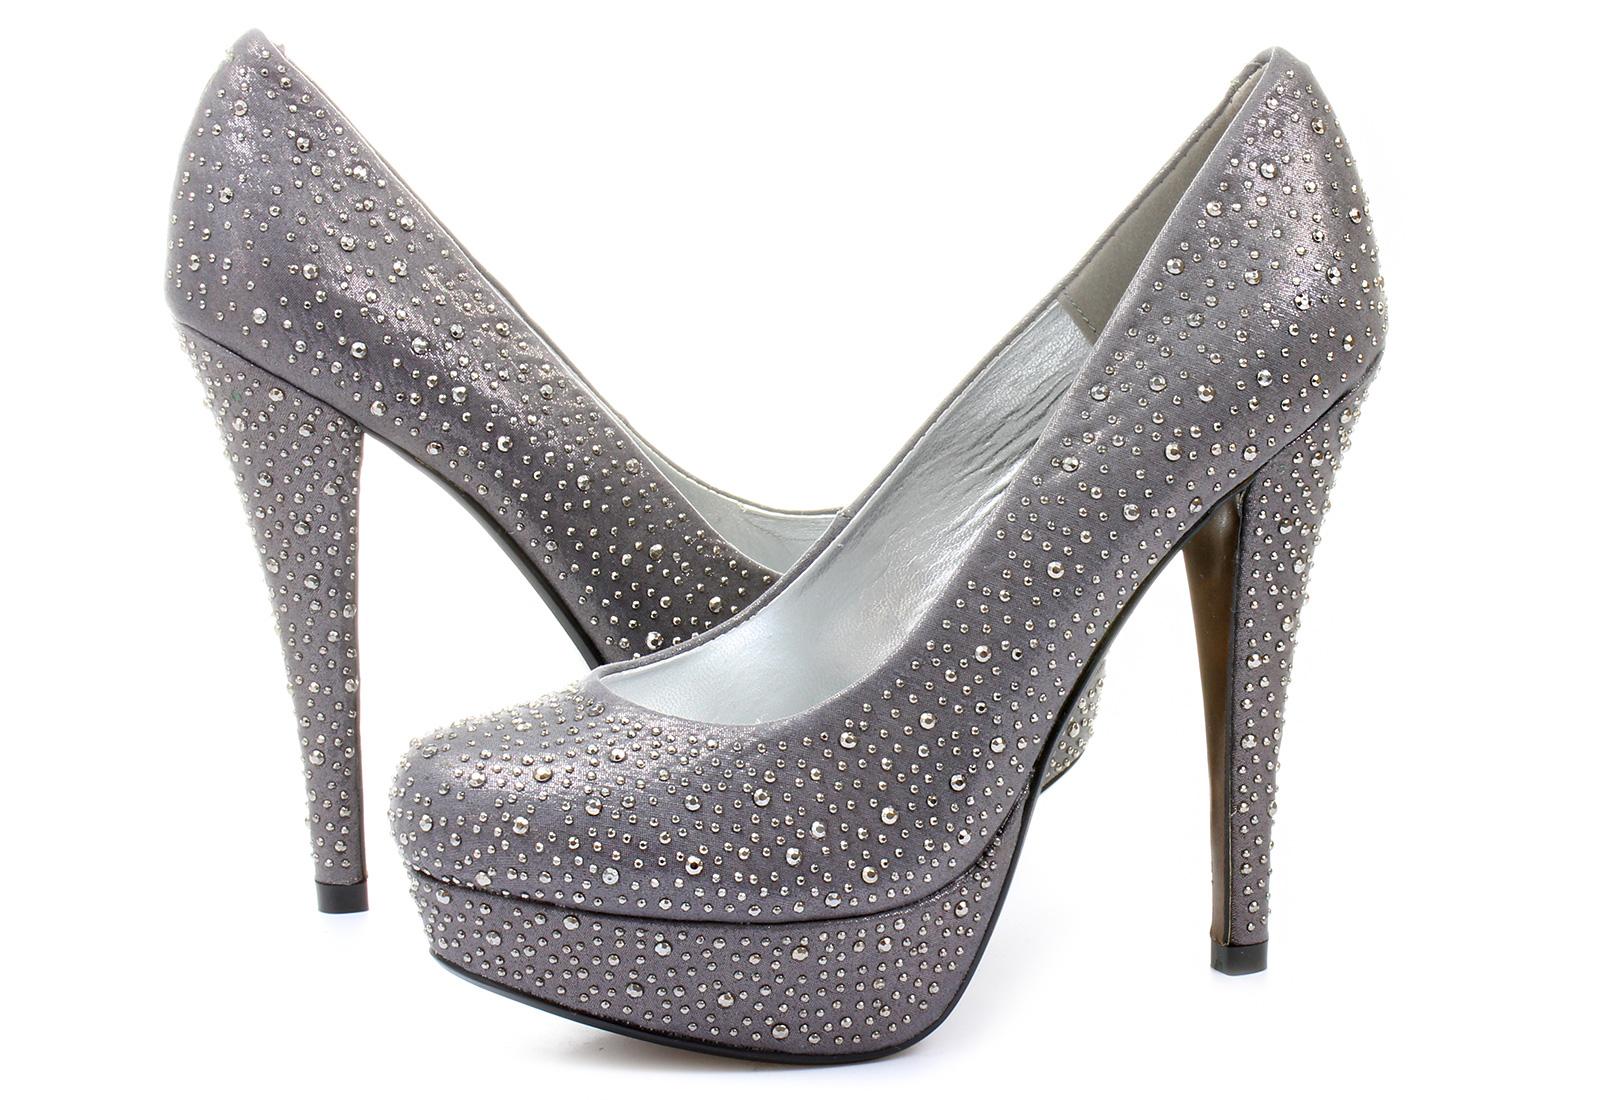 Blink Lodičky - Diamond - 701307-j-102 - Tenisky 9cc1a44f3dc